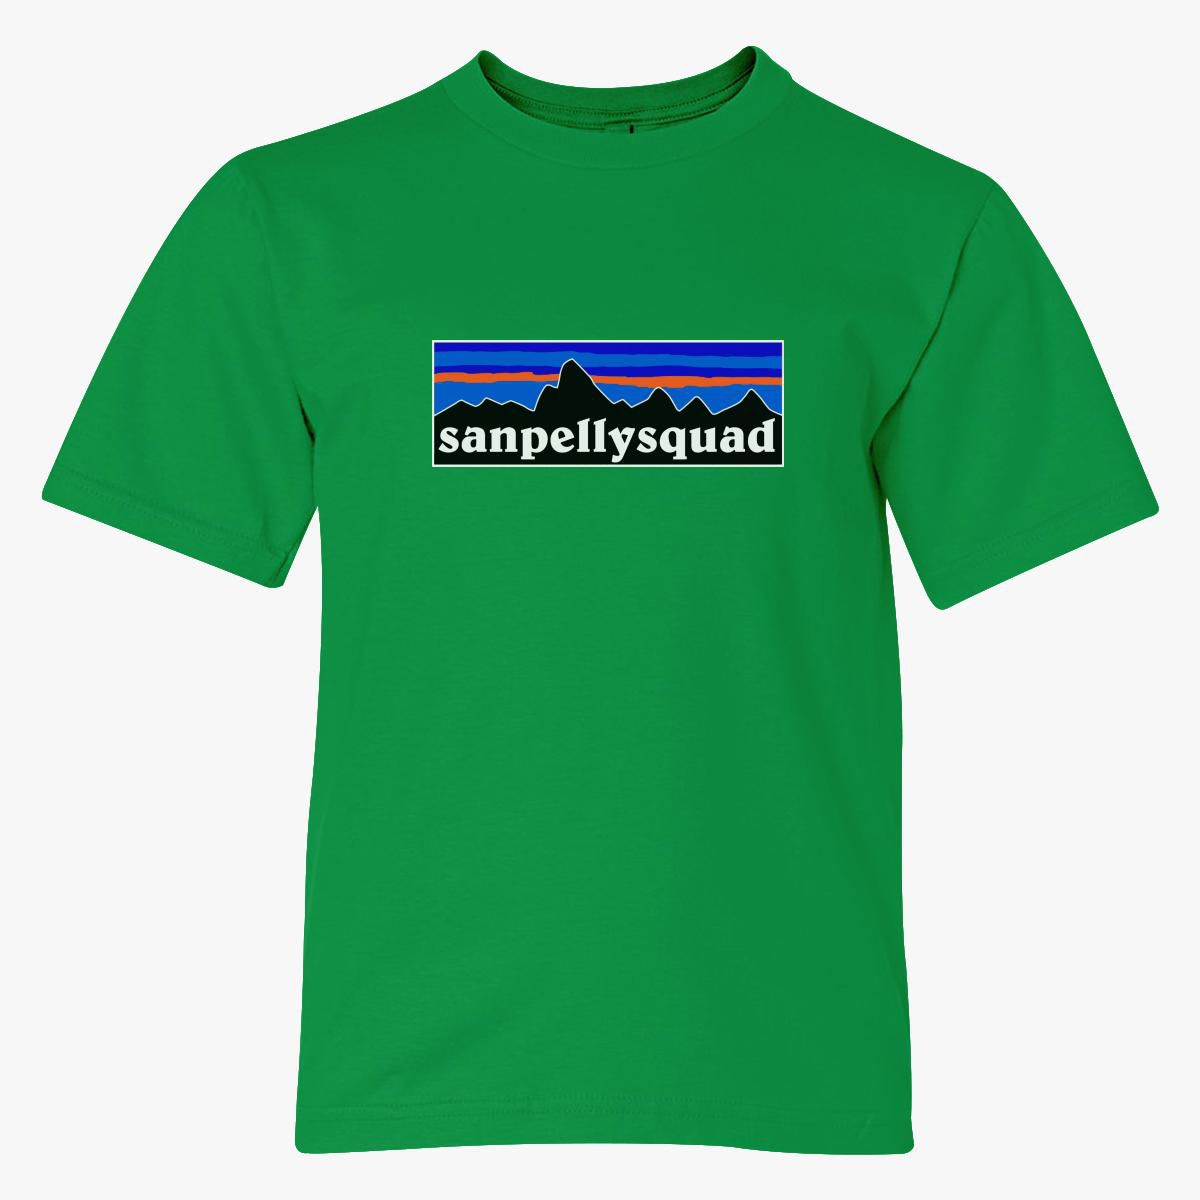 SANPELLYSQUAD FULL LOGO Youth T-shirt